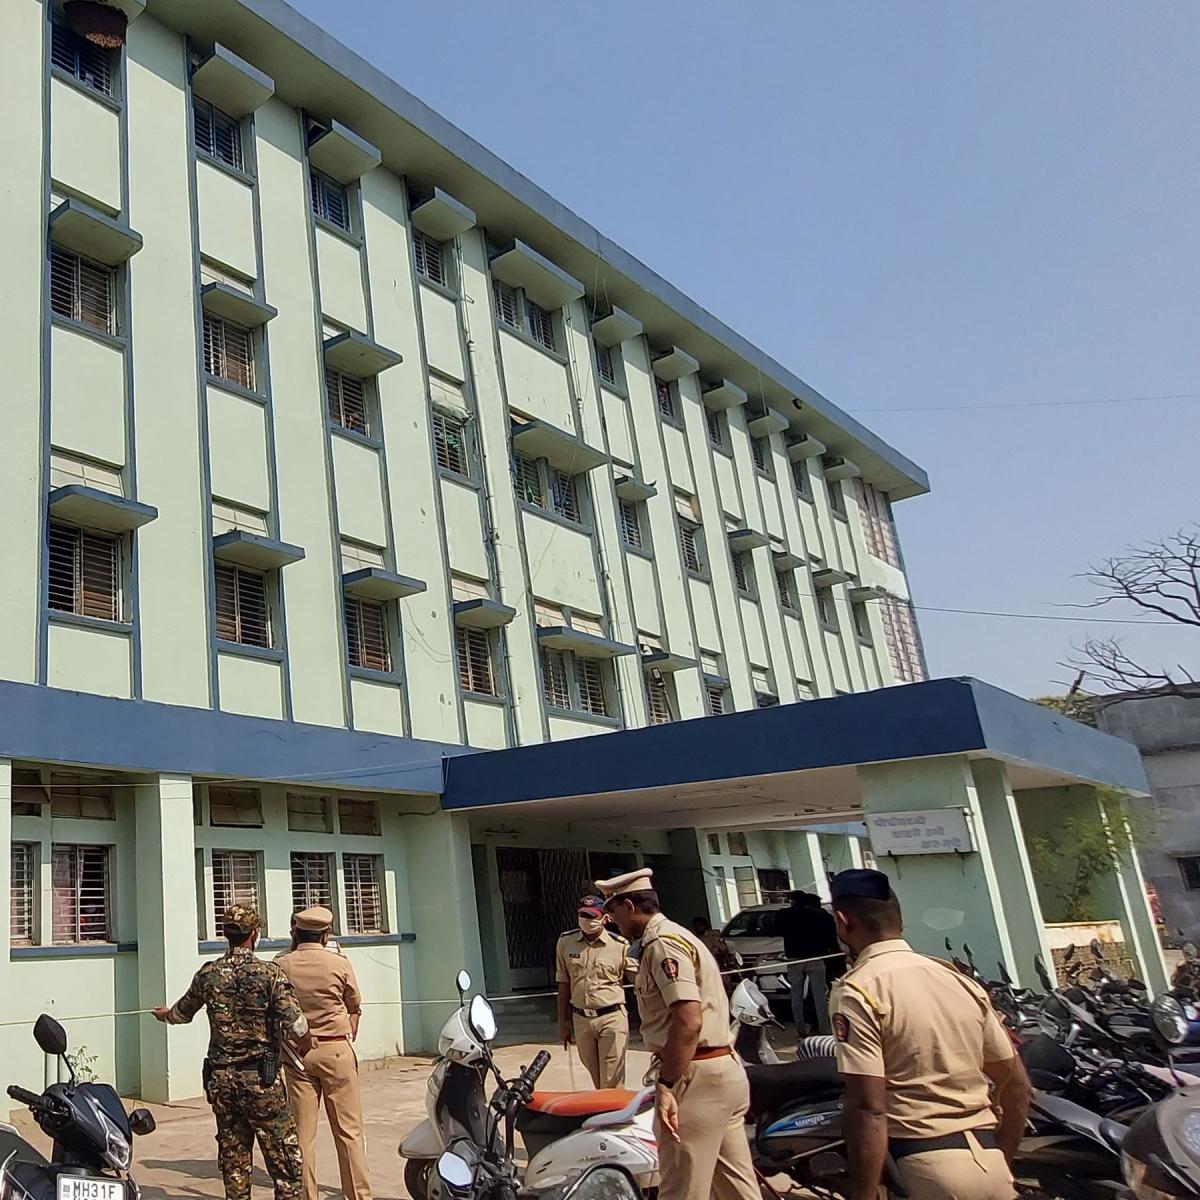 Bhandara hospital fire: BJP calls for bandh demanding judicial inquiry into death of 10 newborns